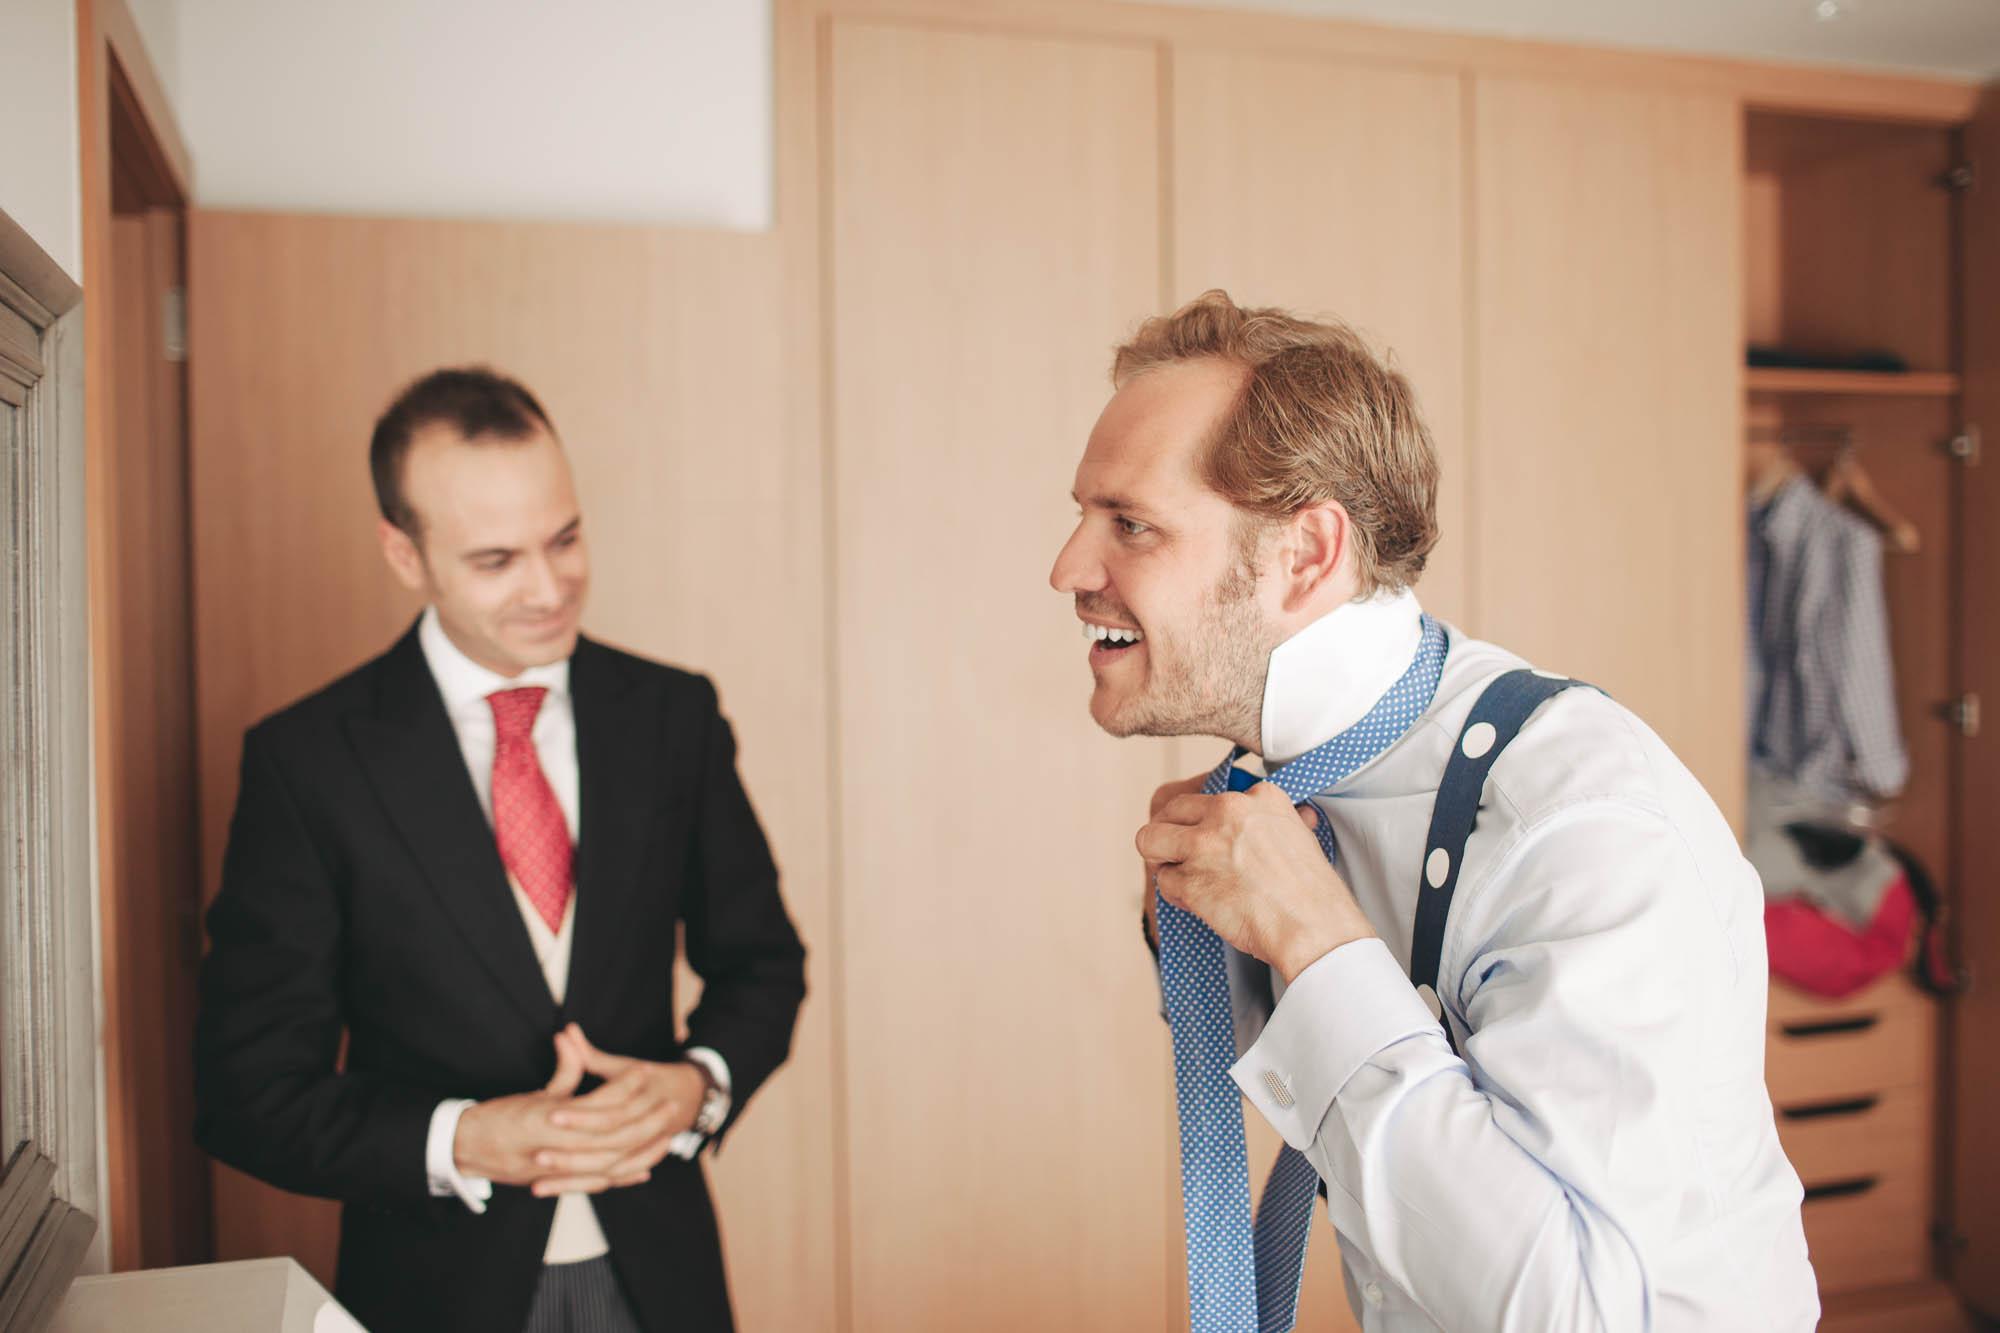 Novio poniéndose una corbata azul